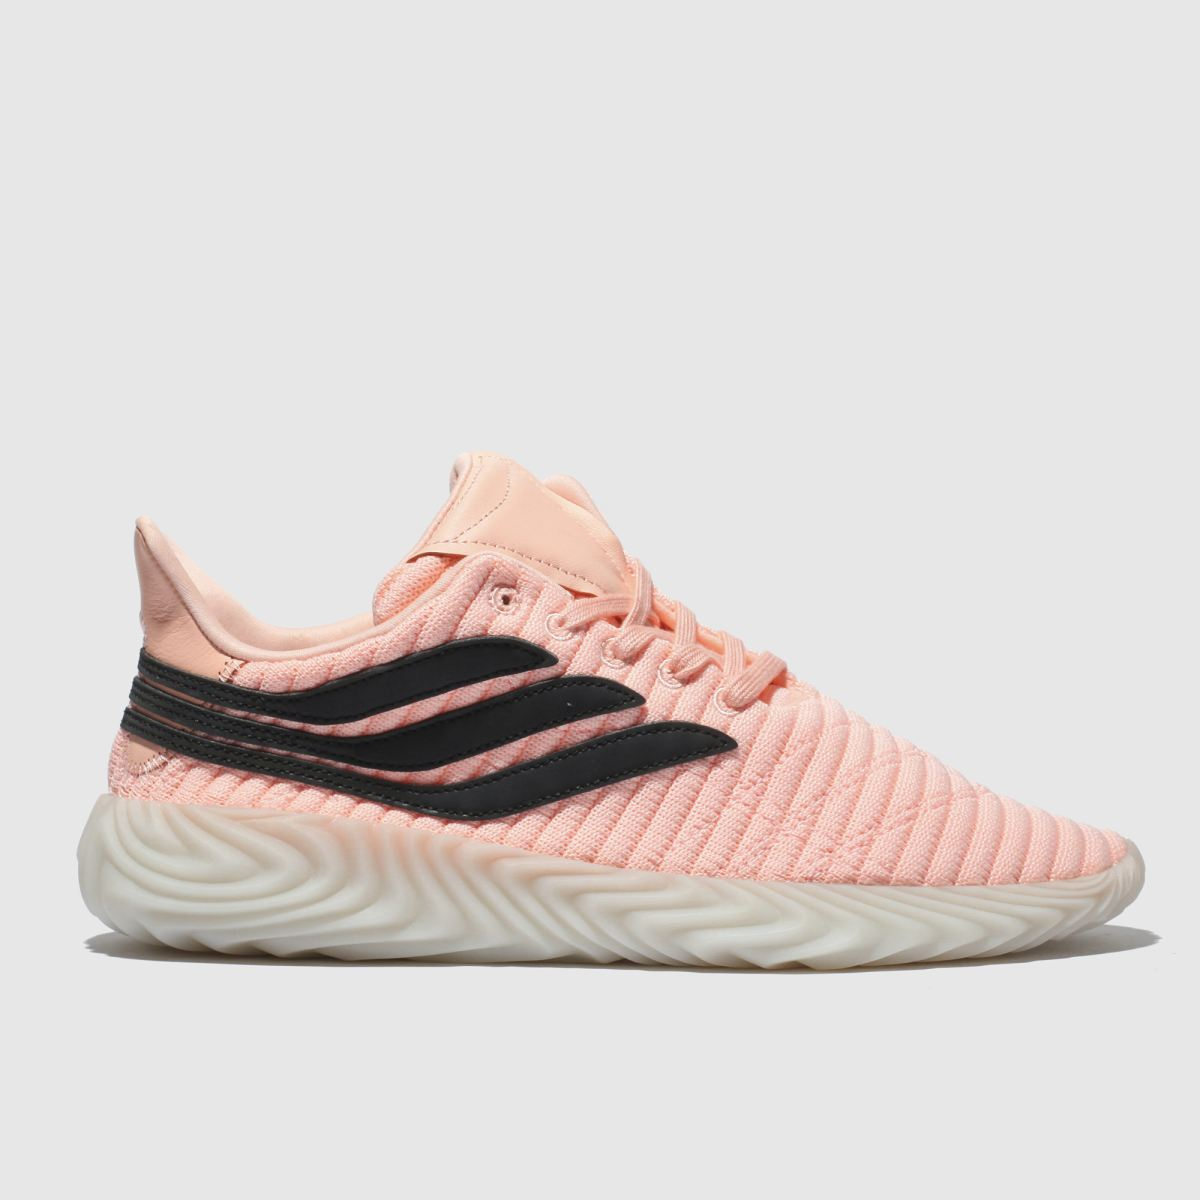 Adidas Pink & Black Sobakov Trainers